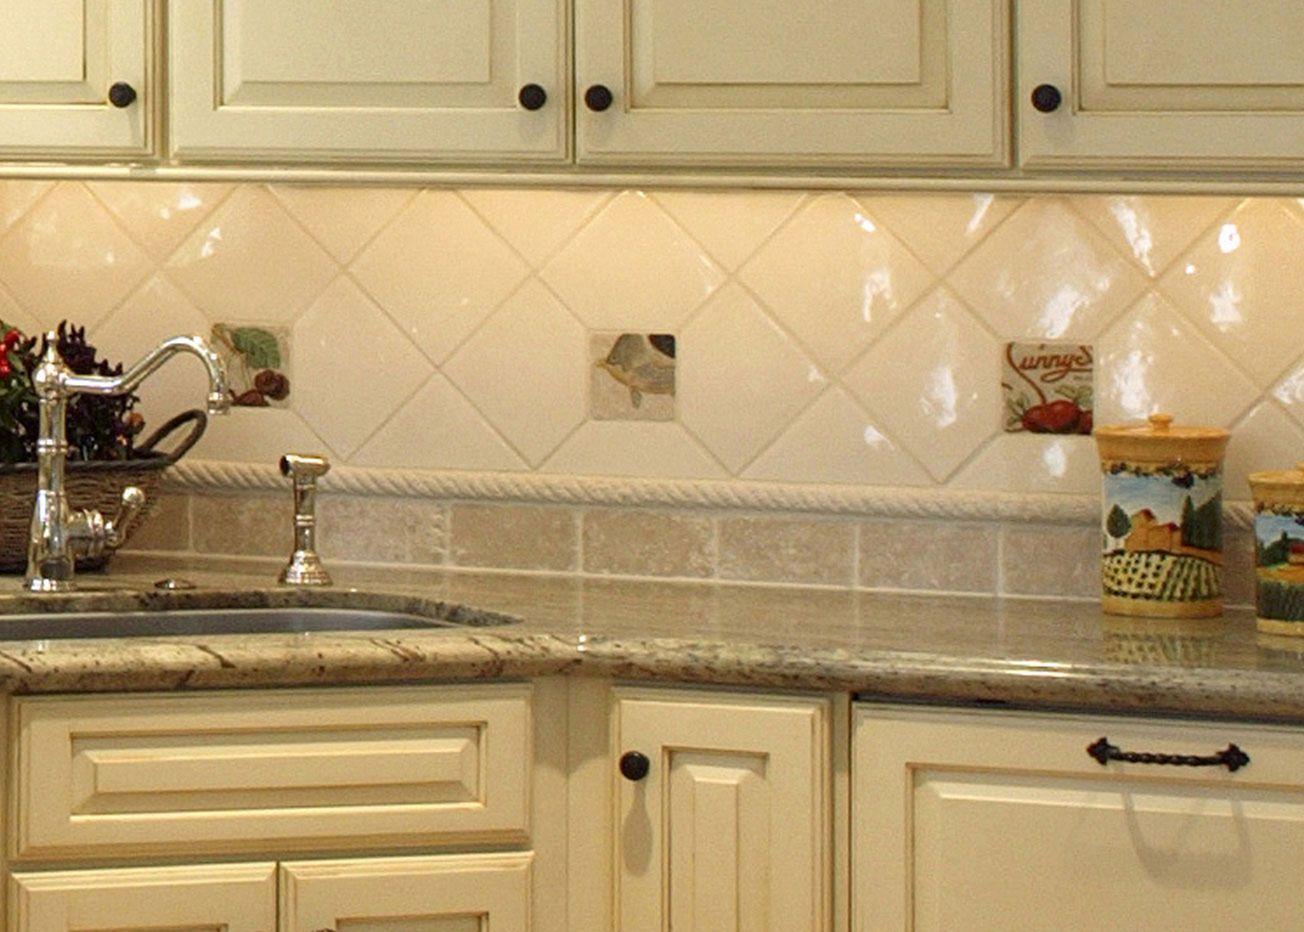 - 25+ Amazing Backsplash Kitchen Wall Ideas That Every People Want